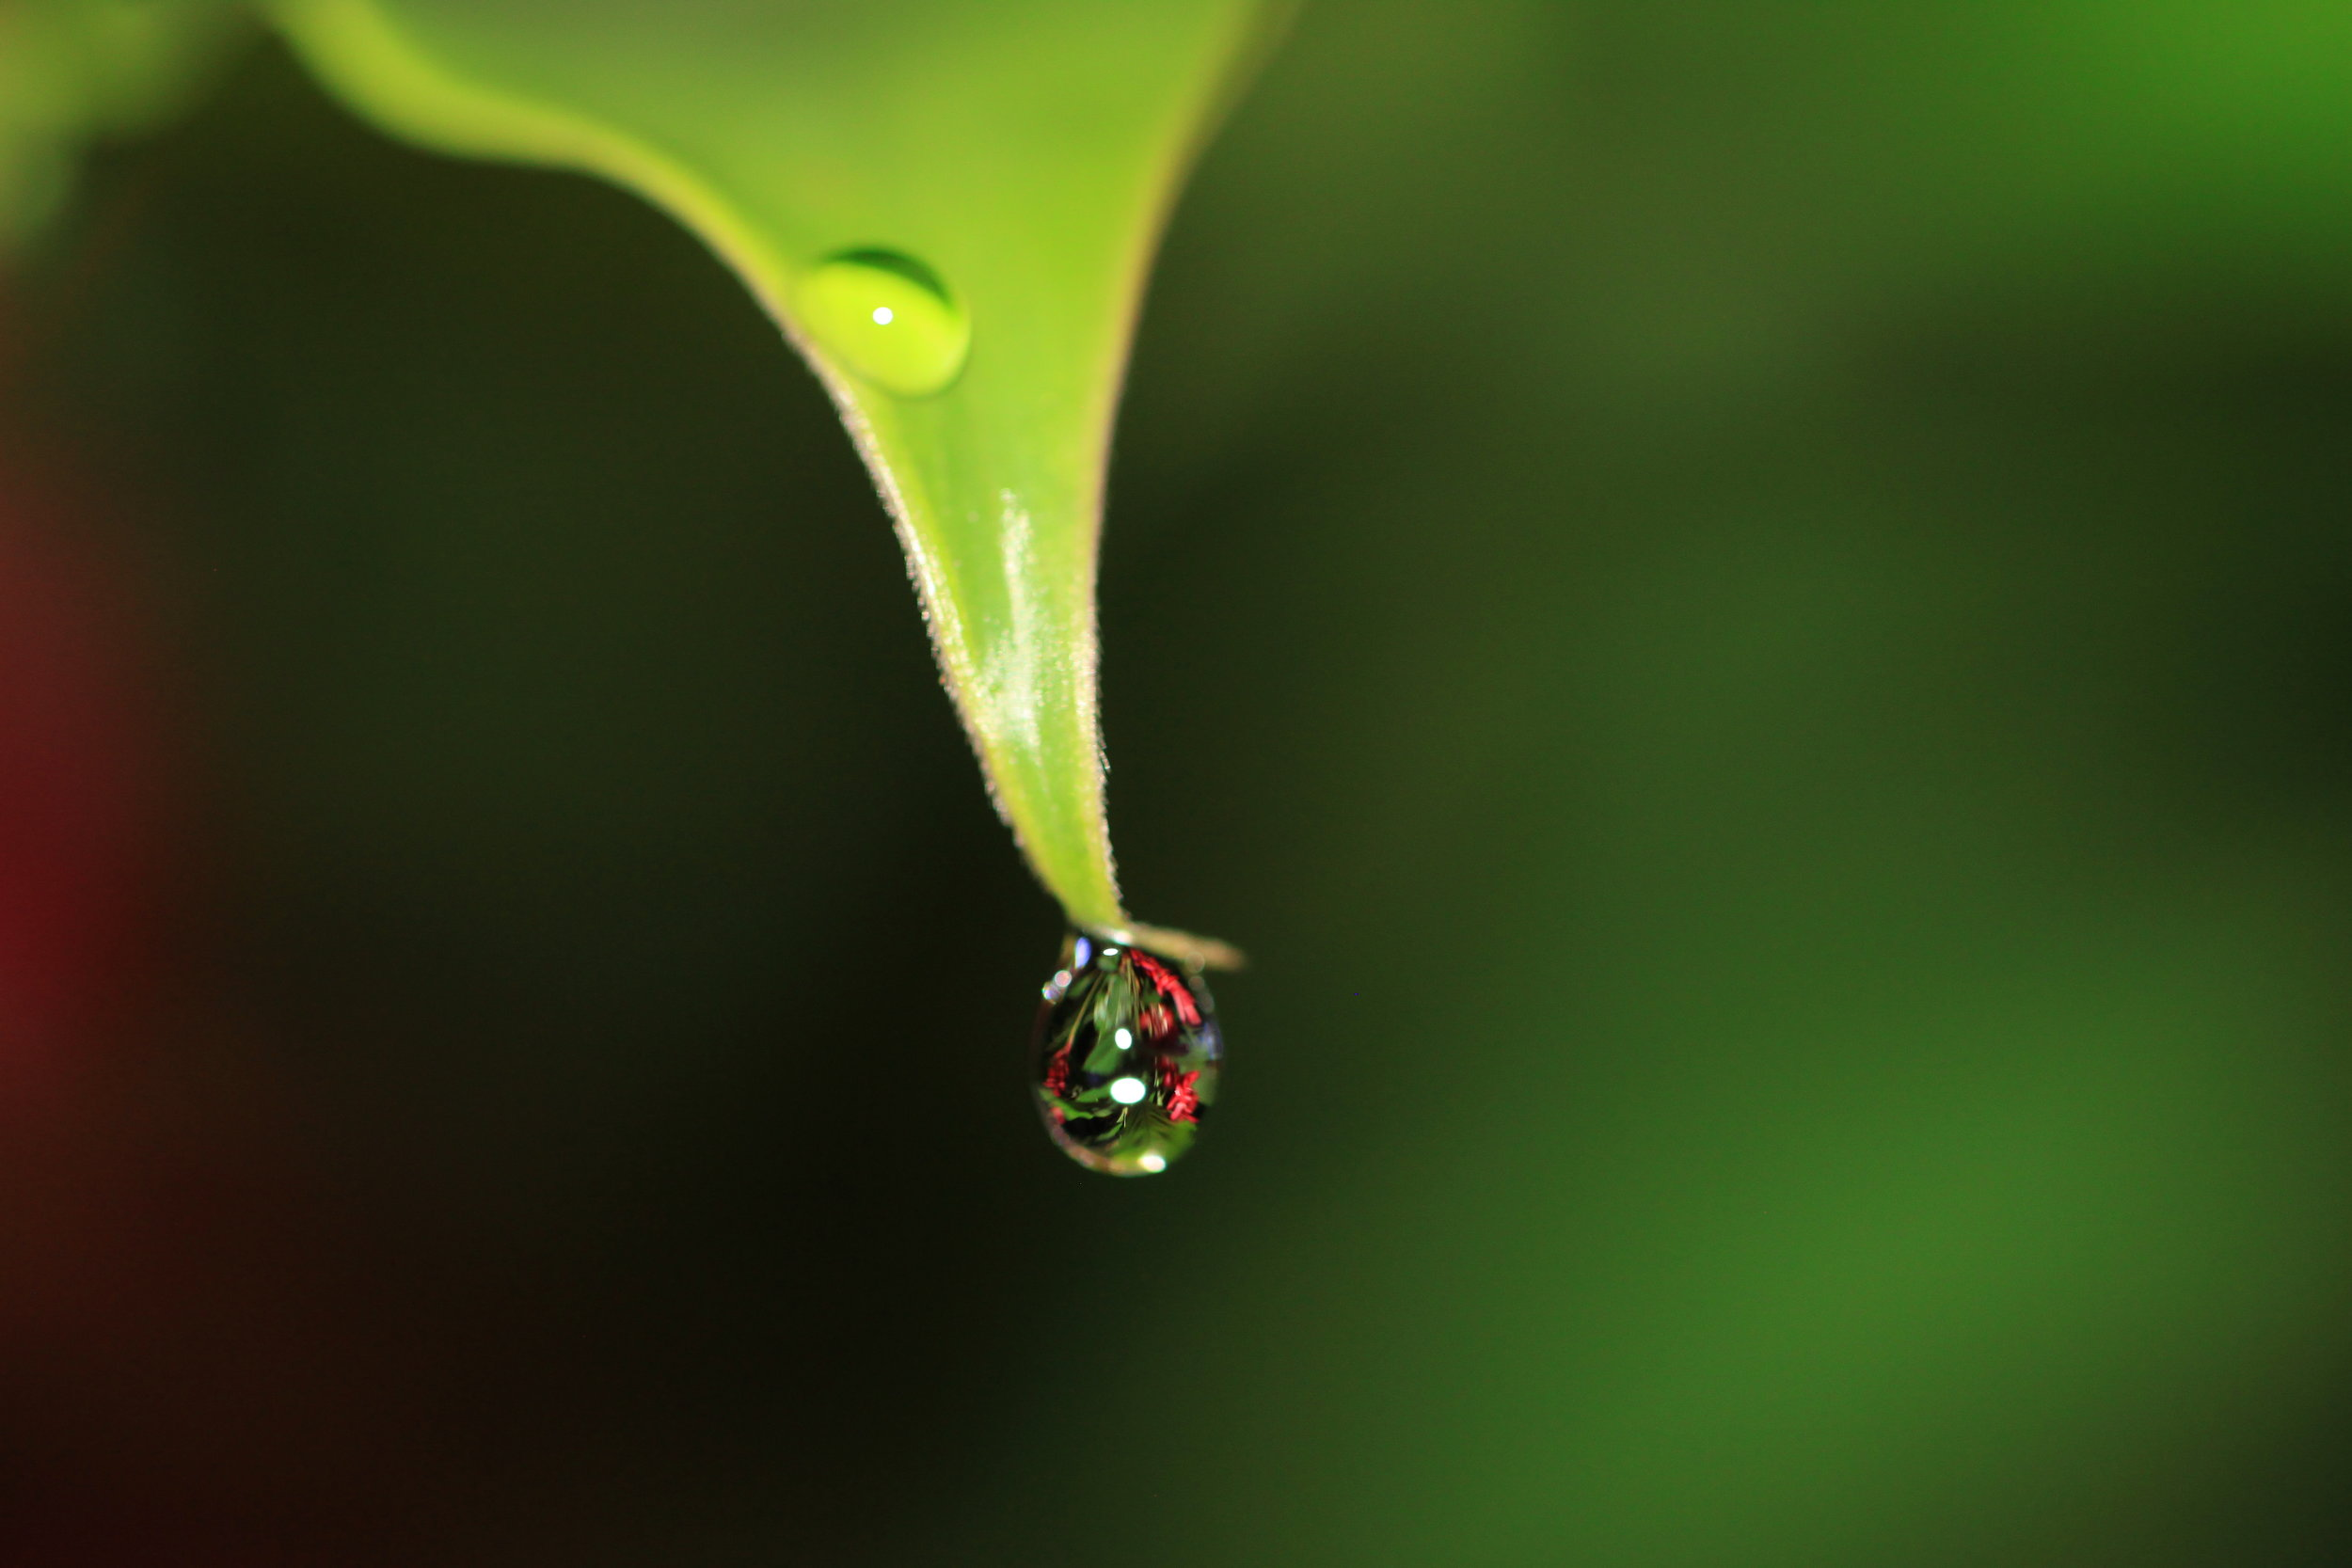 dew-drop-at-nigh-Costa-Rica.jpg